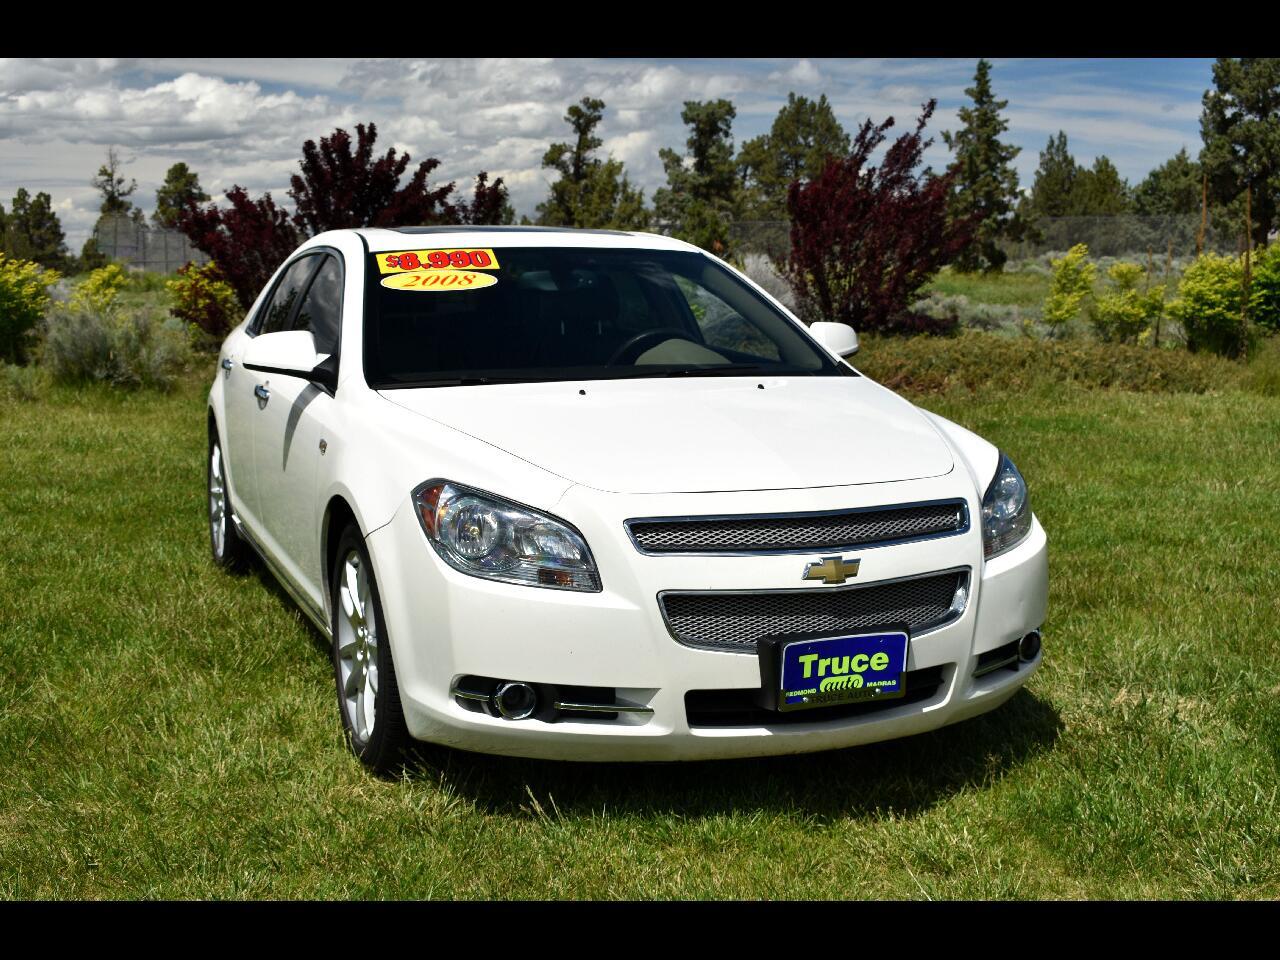 2008 Chevrolet Malibu 4DR SDN LTZ **LOW MILES**